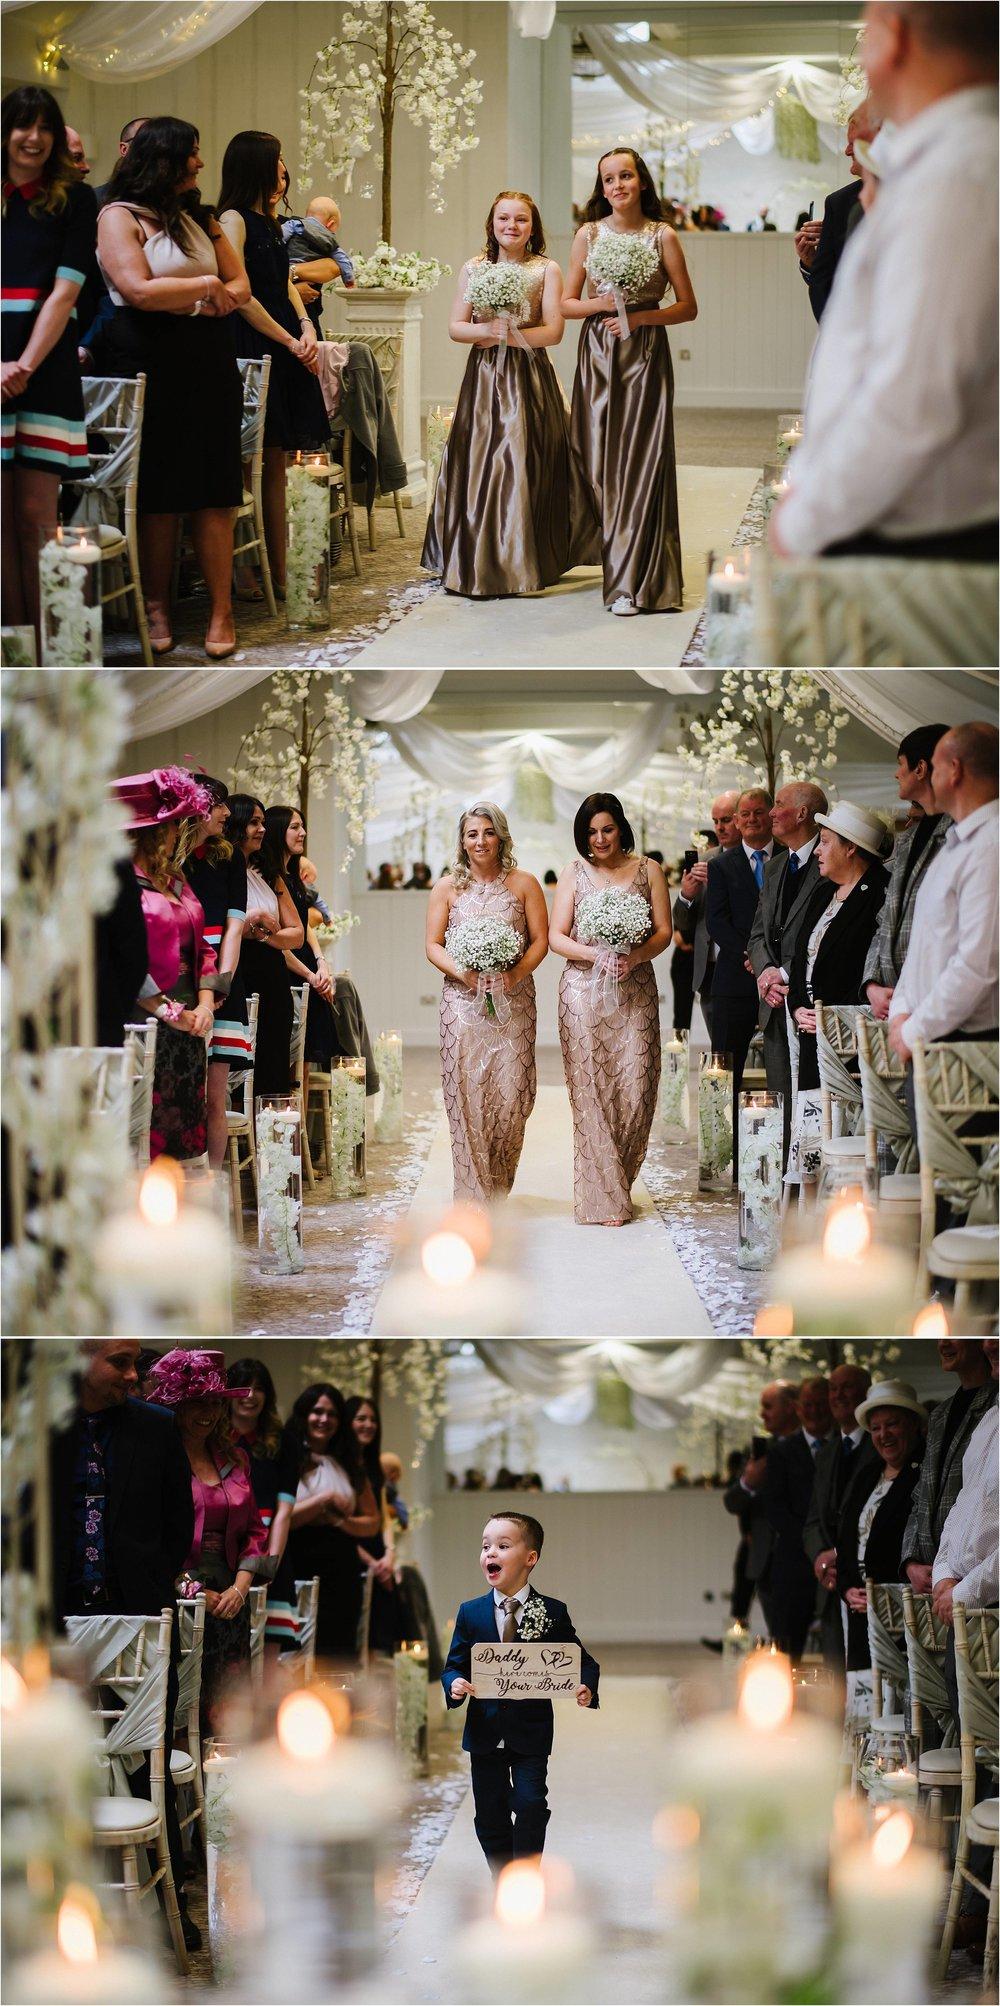 Carly & Ryan Wedding_0026.jpg